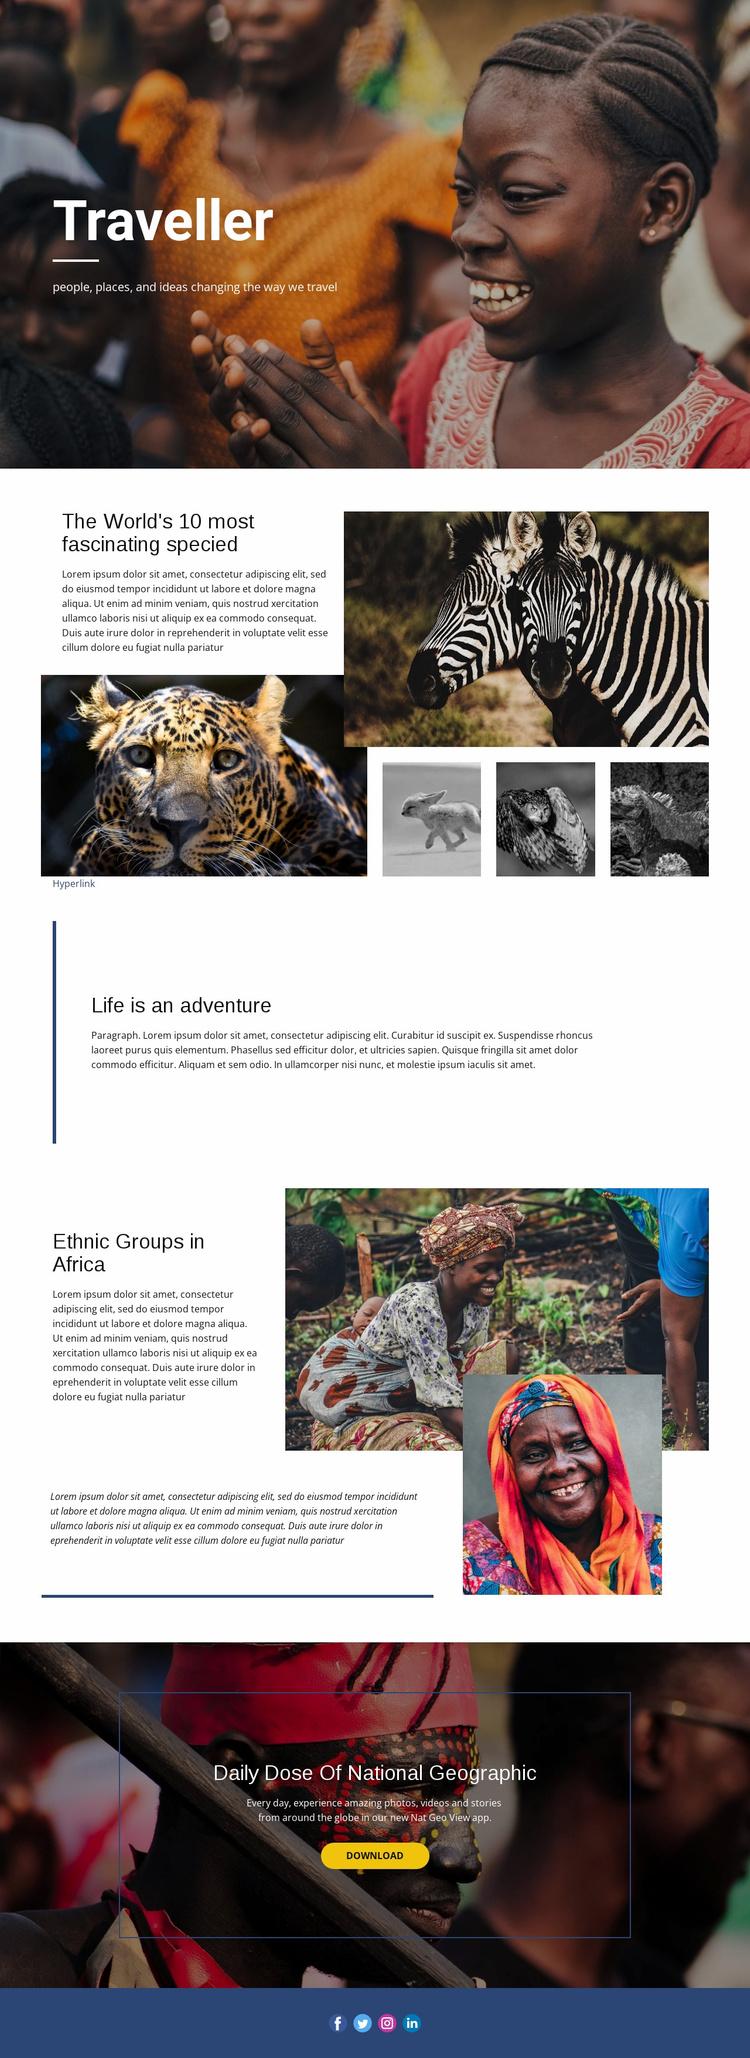 Life is an adventure Website Template